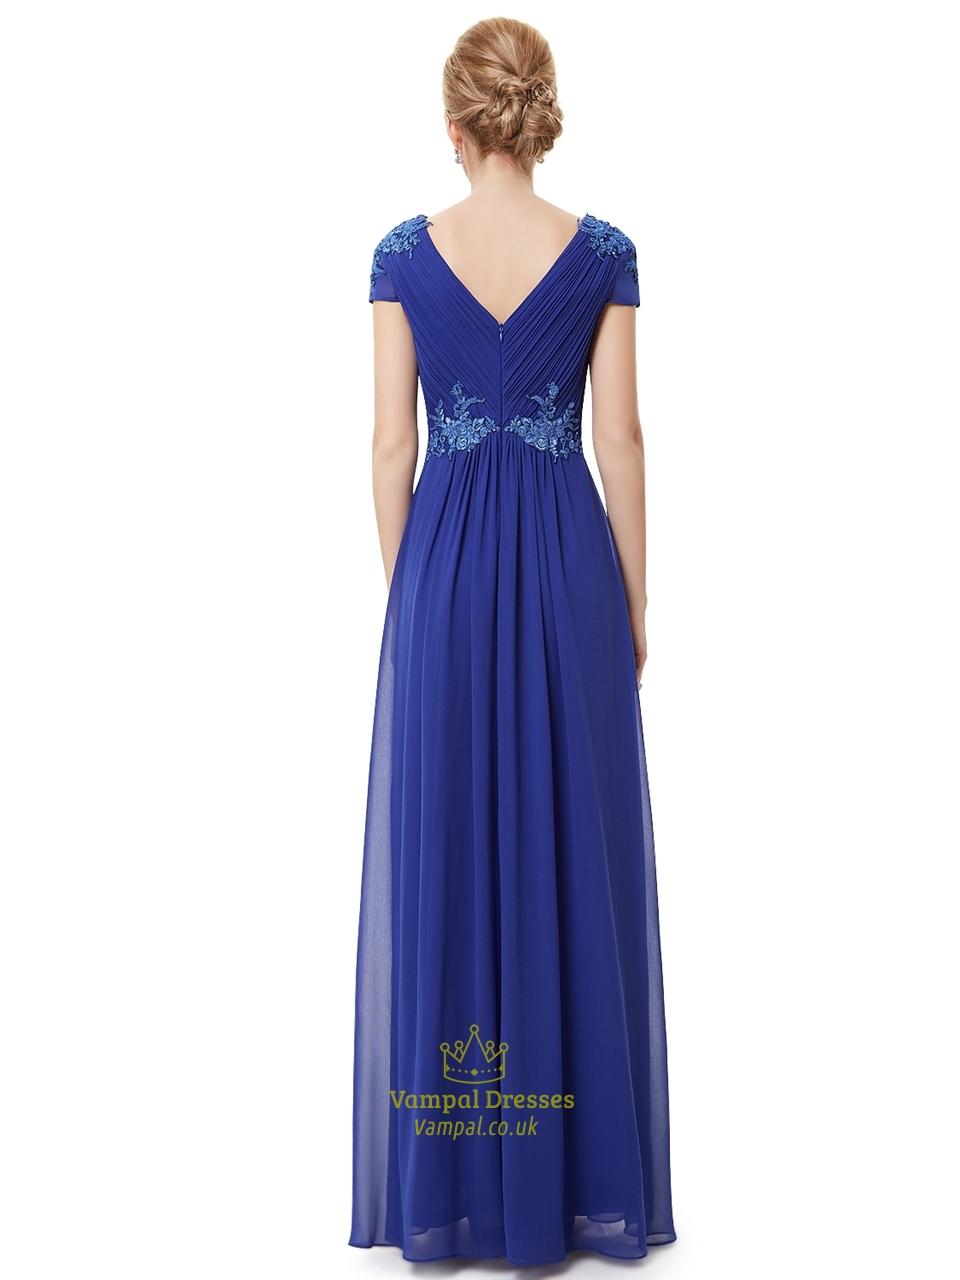 Royal Blue Cap Sleeve Chiffon Prom Dress With Applique Embellishment | Vampal Dresses